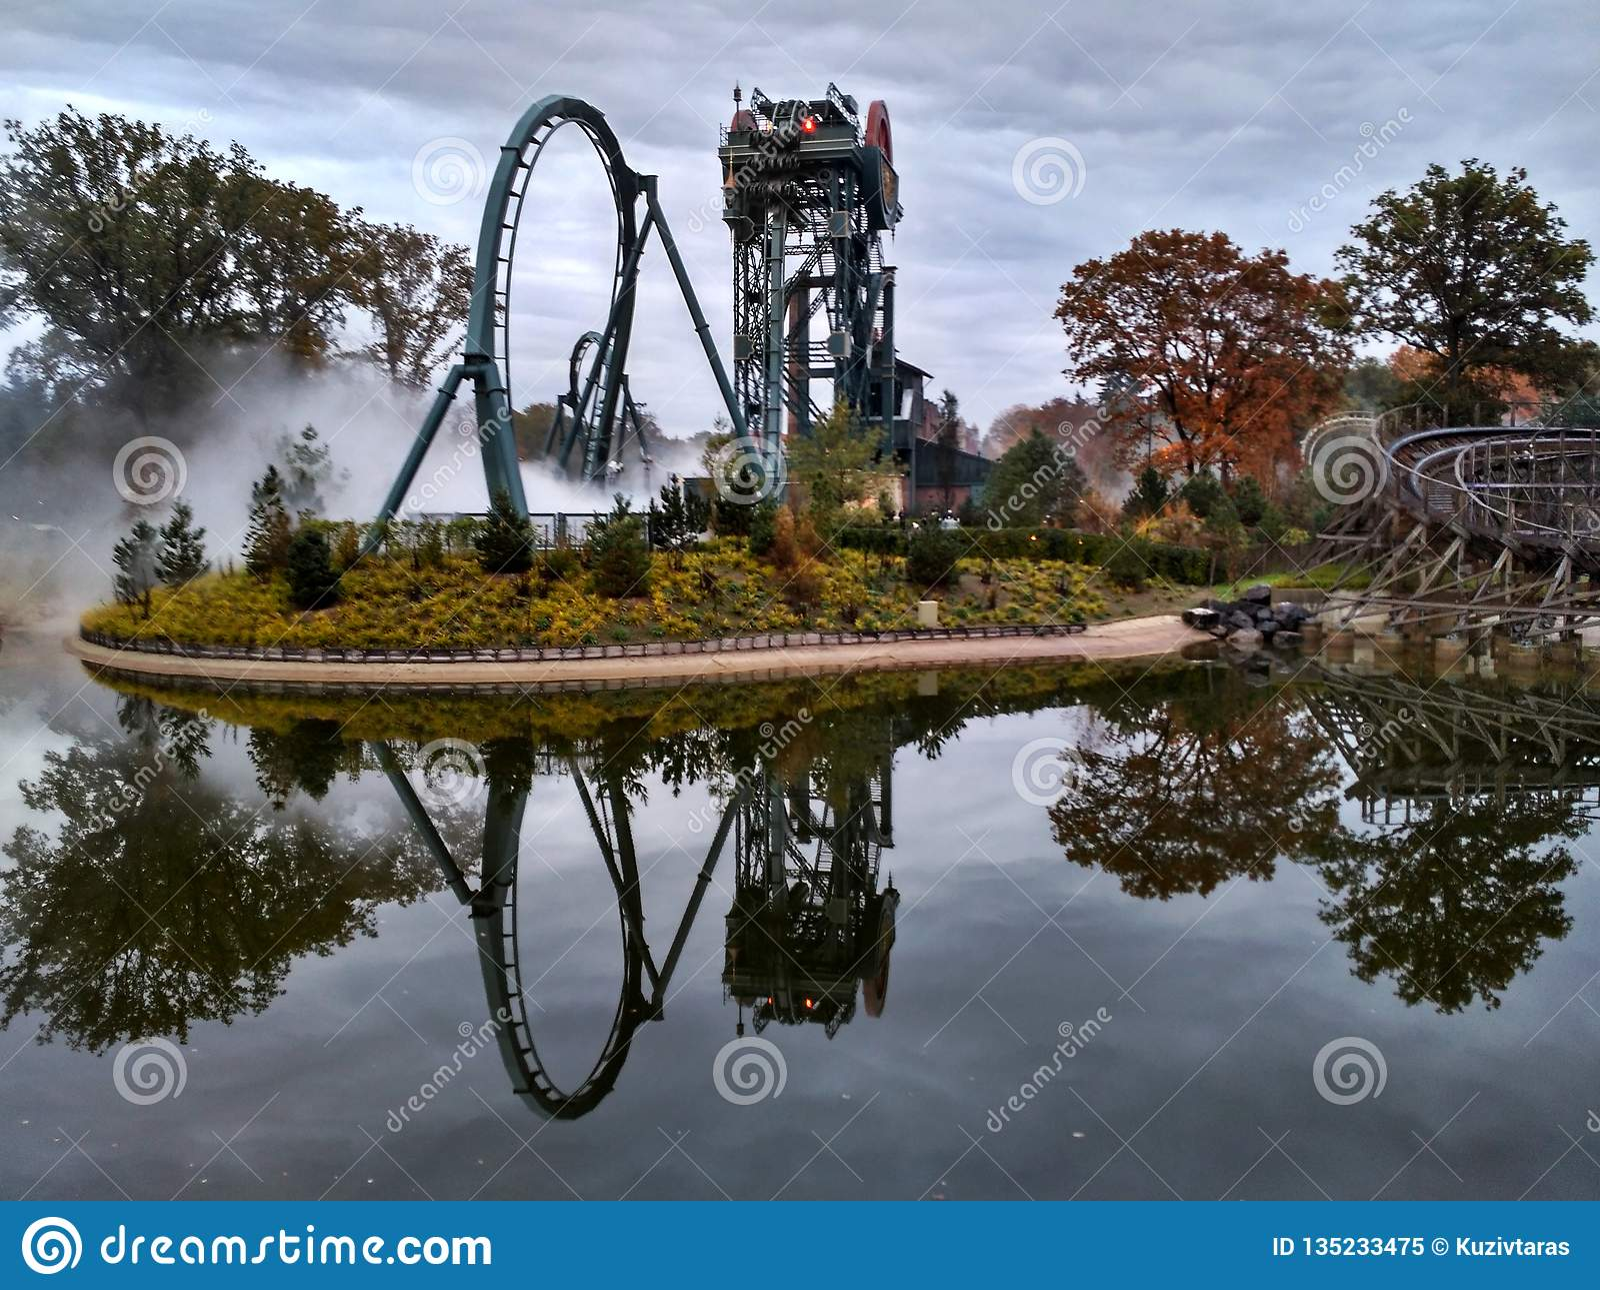 Kaatsheuvel / The Netherlands - November 03 2016: Speed roller coaster Baron 1898 in action in Theme Park Efteling. Symmetric